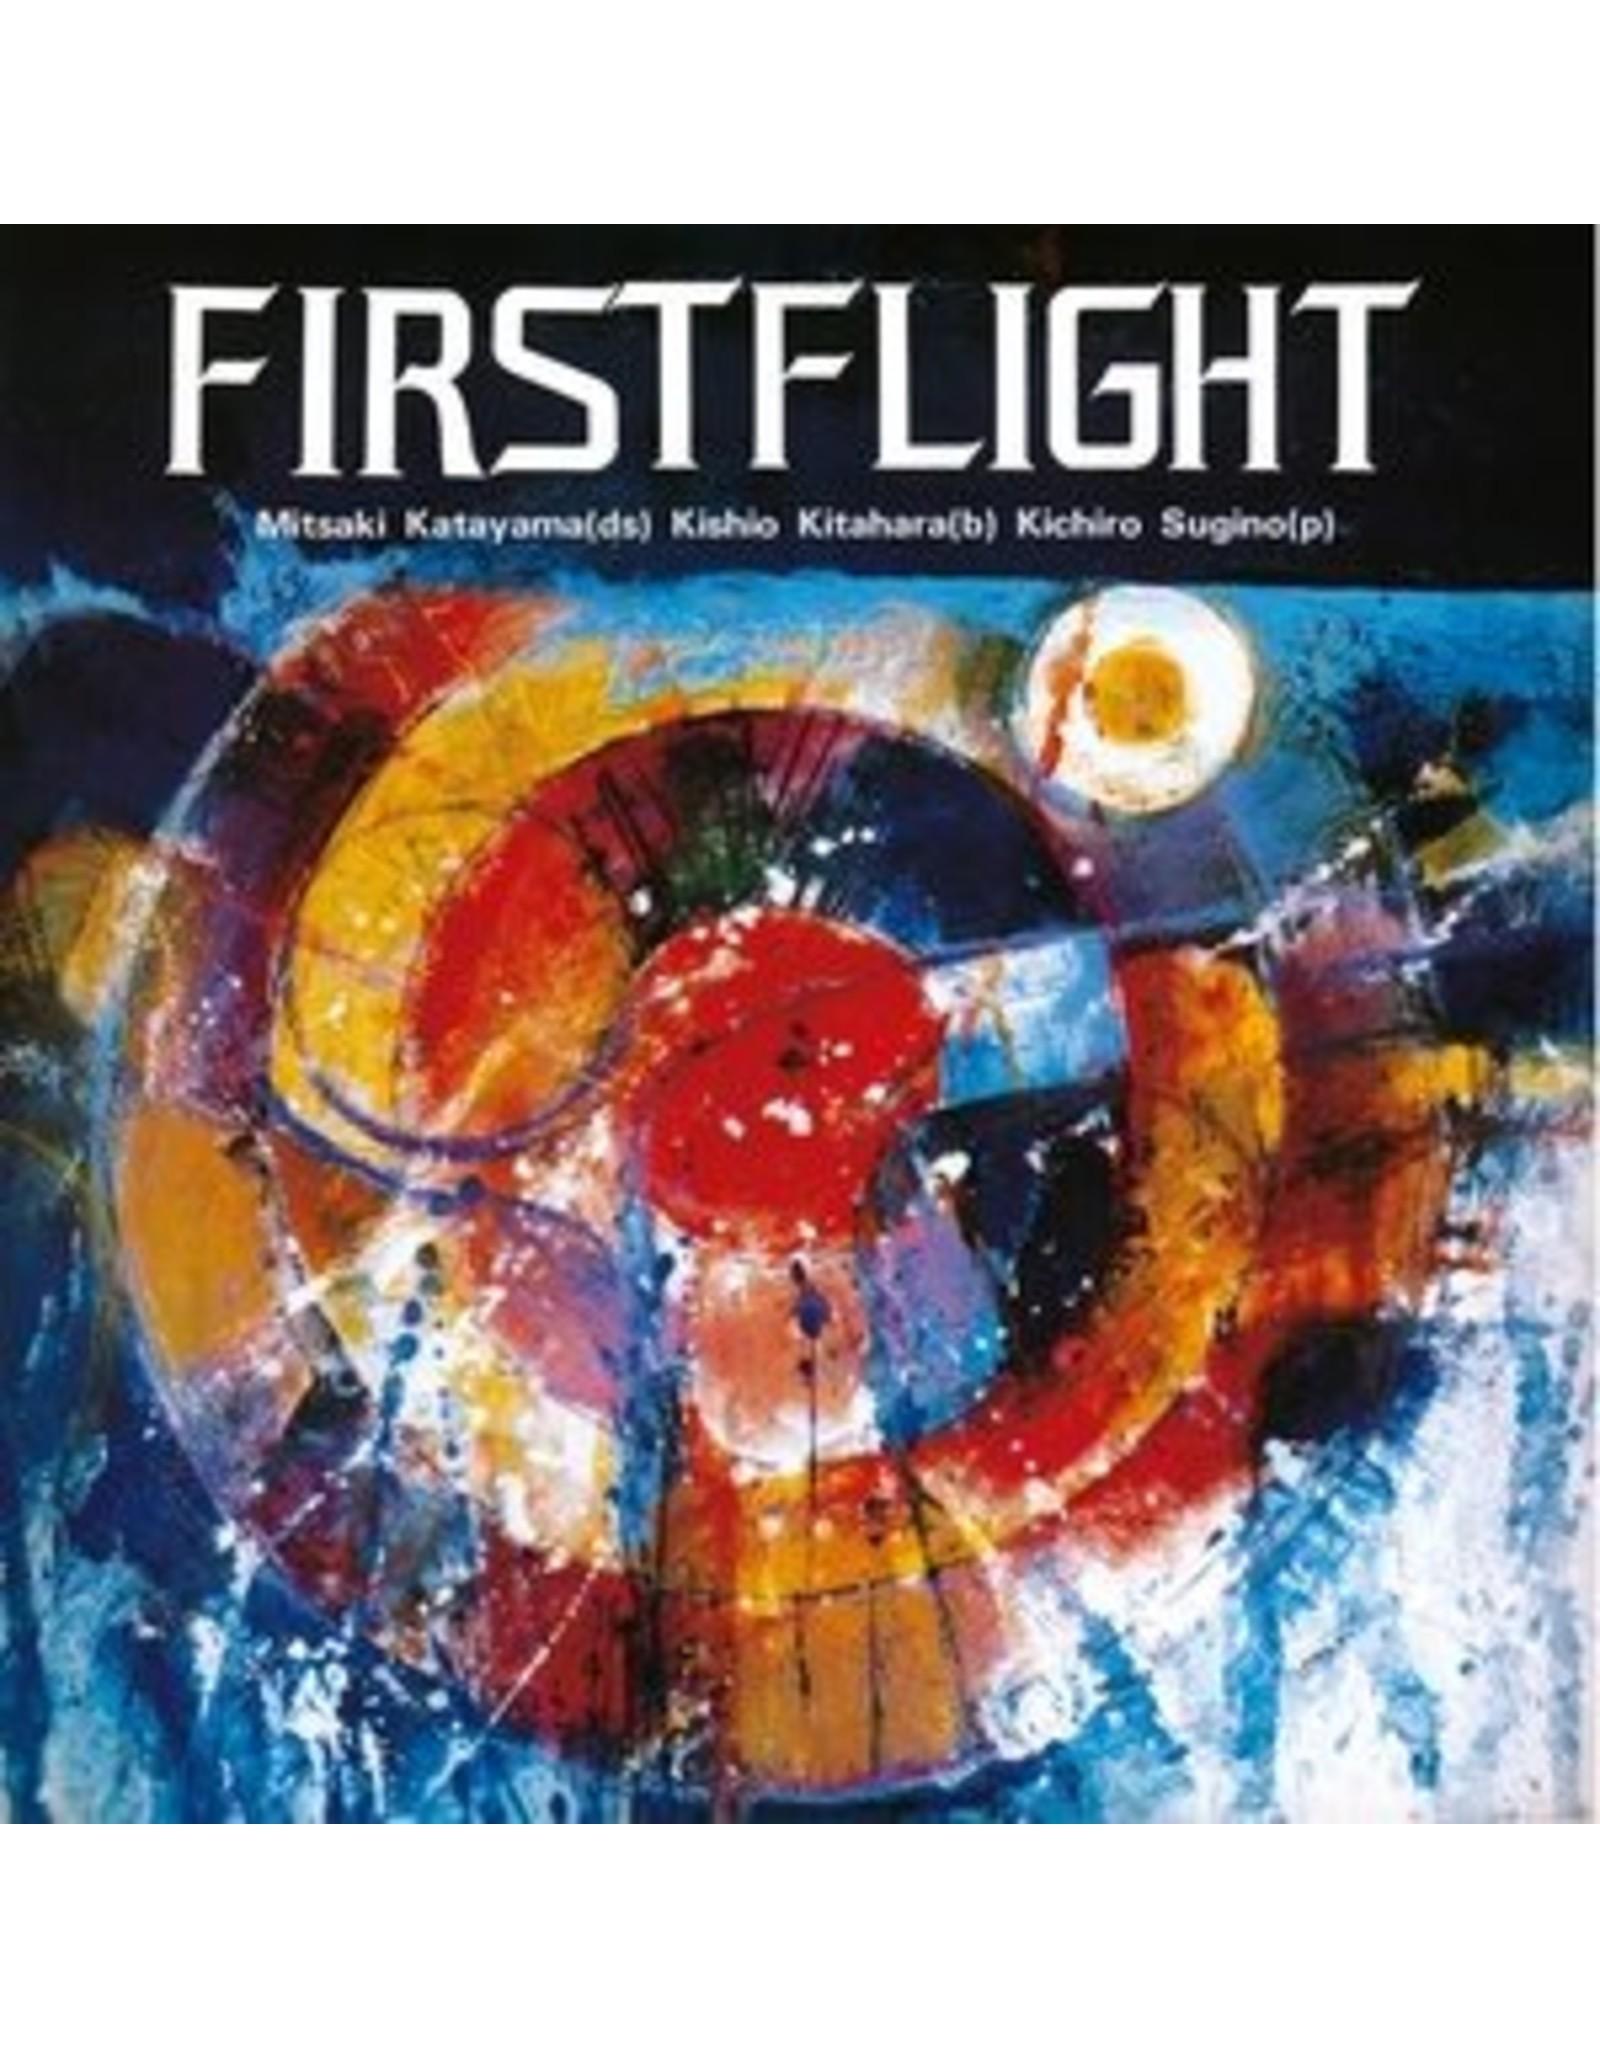 Studio Mule Katayama, Mitsuaki Trio: First Flight LP